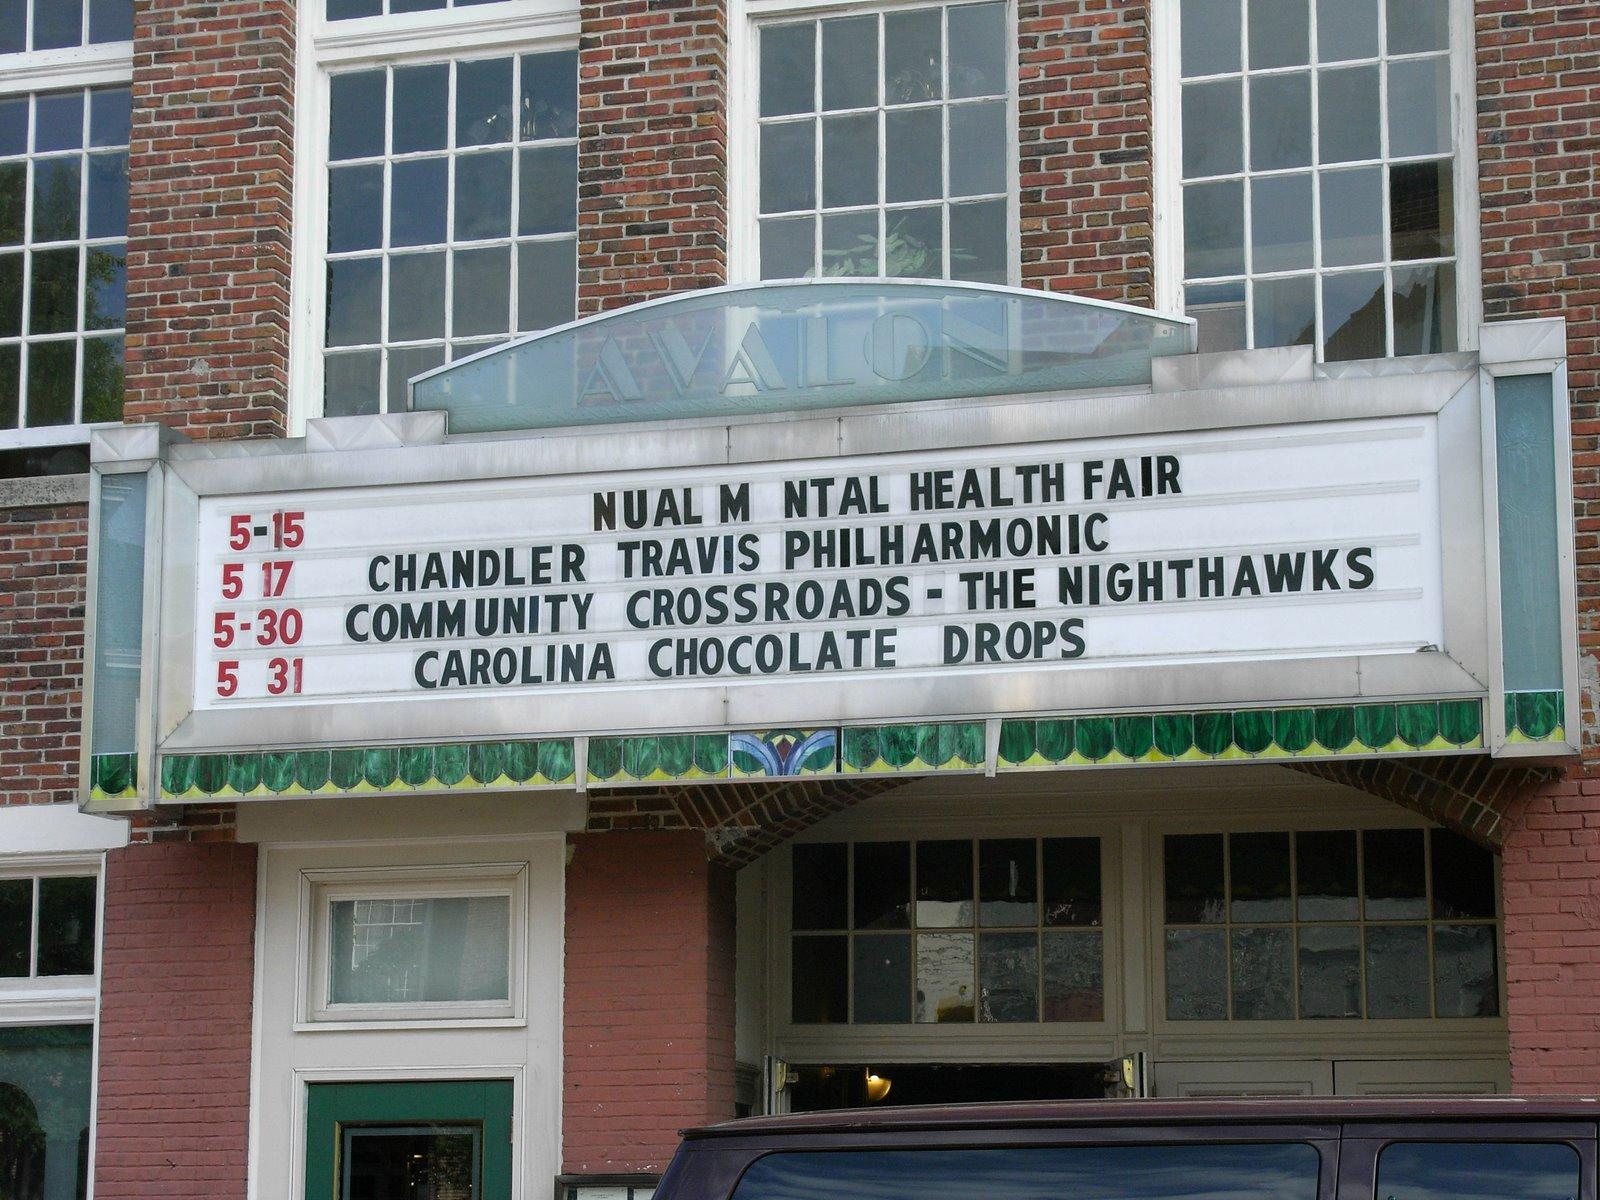 Chandler Travis Philharmonic Live @ Avalon Theatre